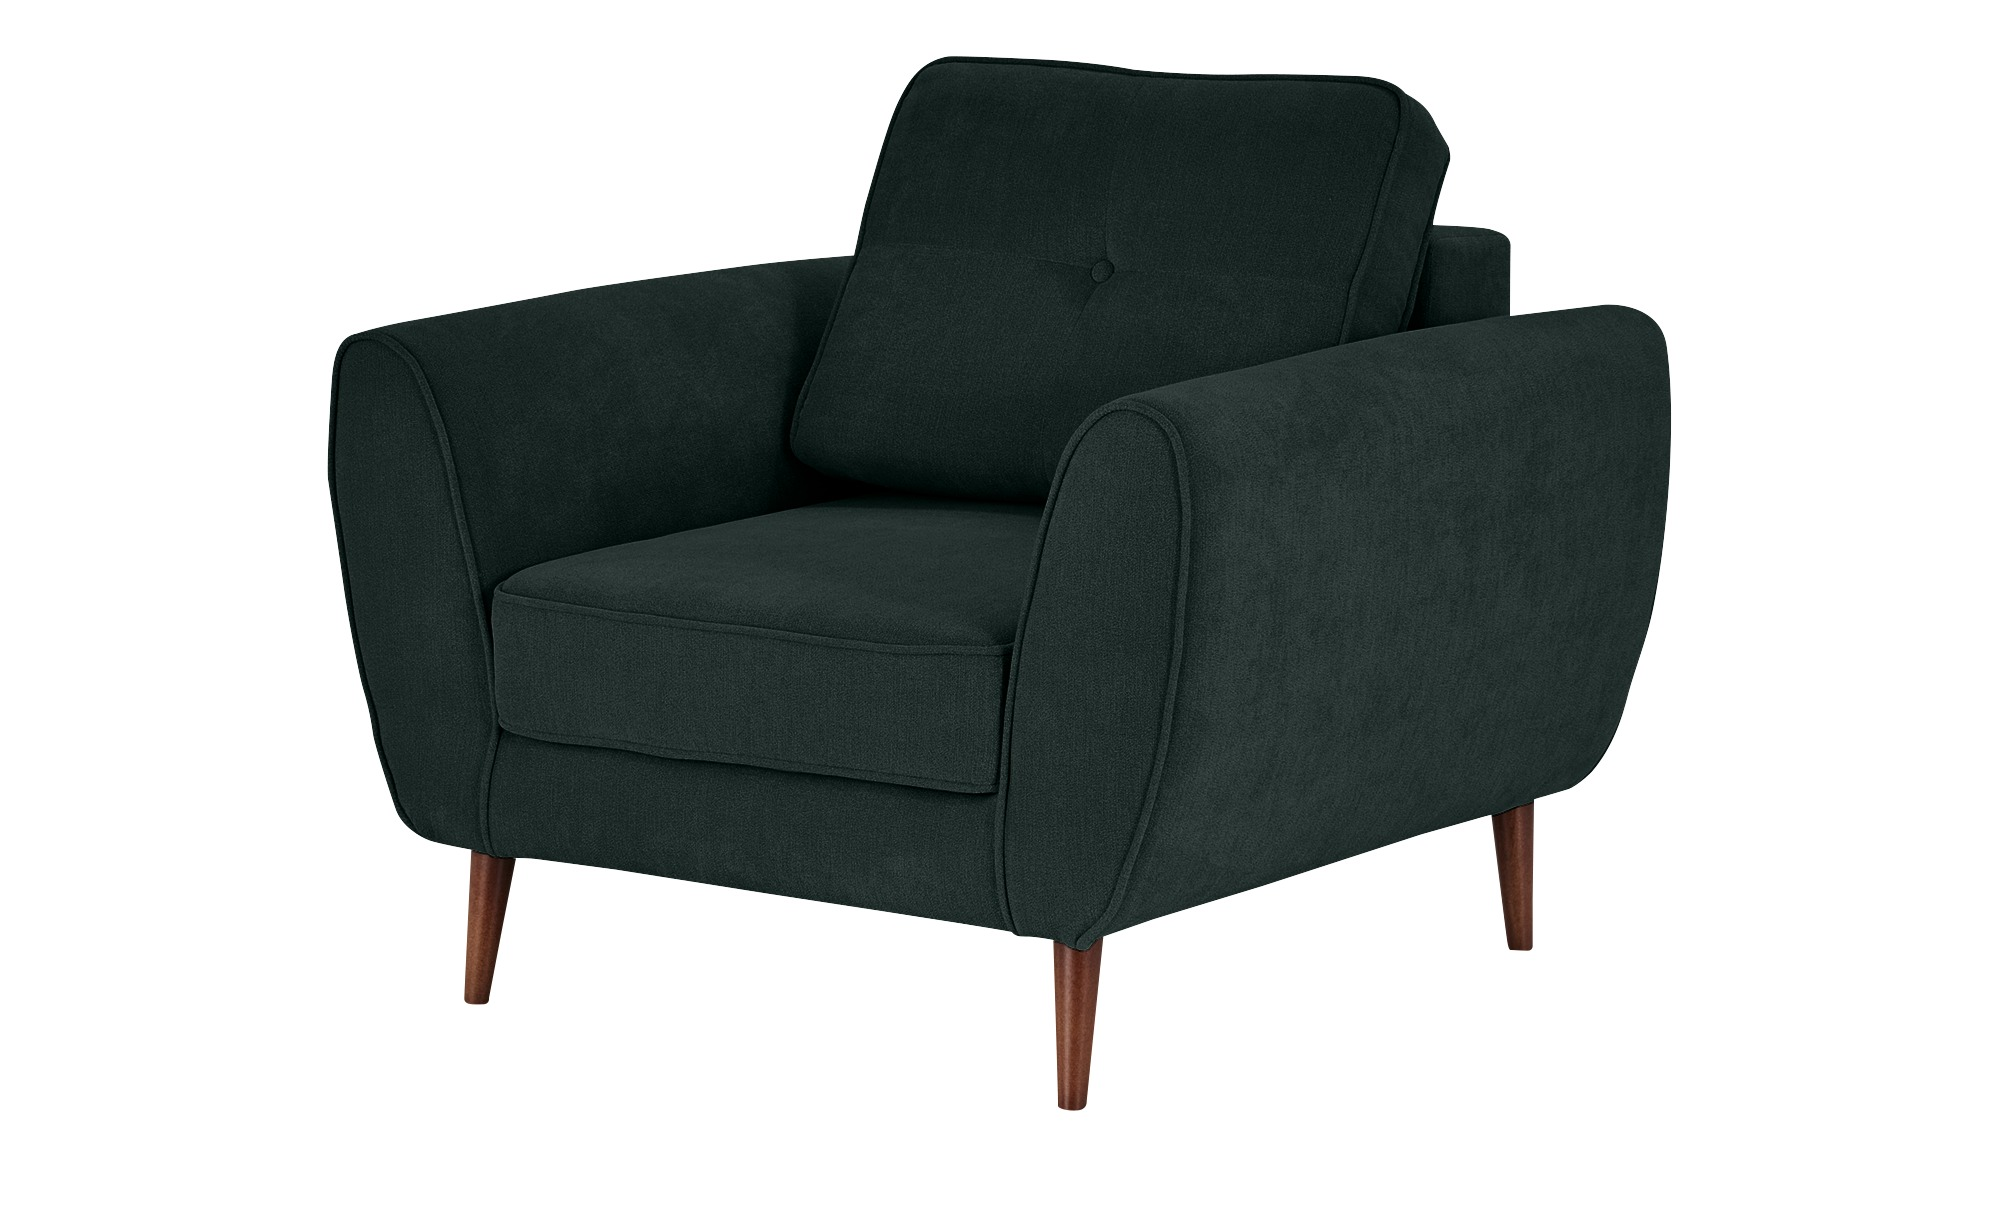 switch Sessel  Candy ¦ schwarz ¦ Maße (cm): B: 102 H: 85 T: 94 Polstermöbel > Sessel > Polstersessel - Höffner